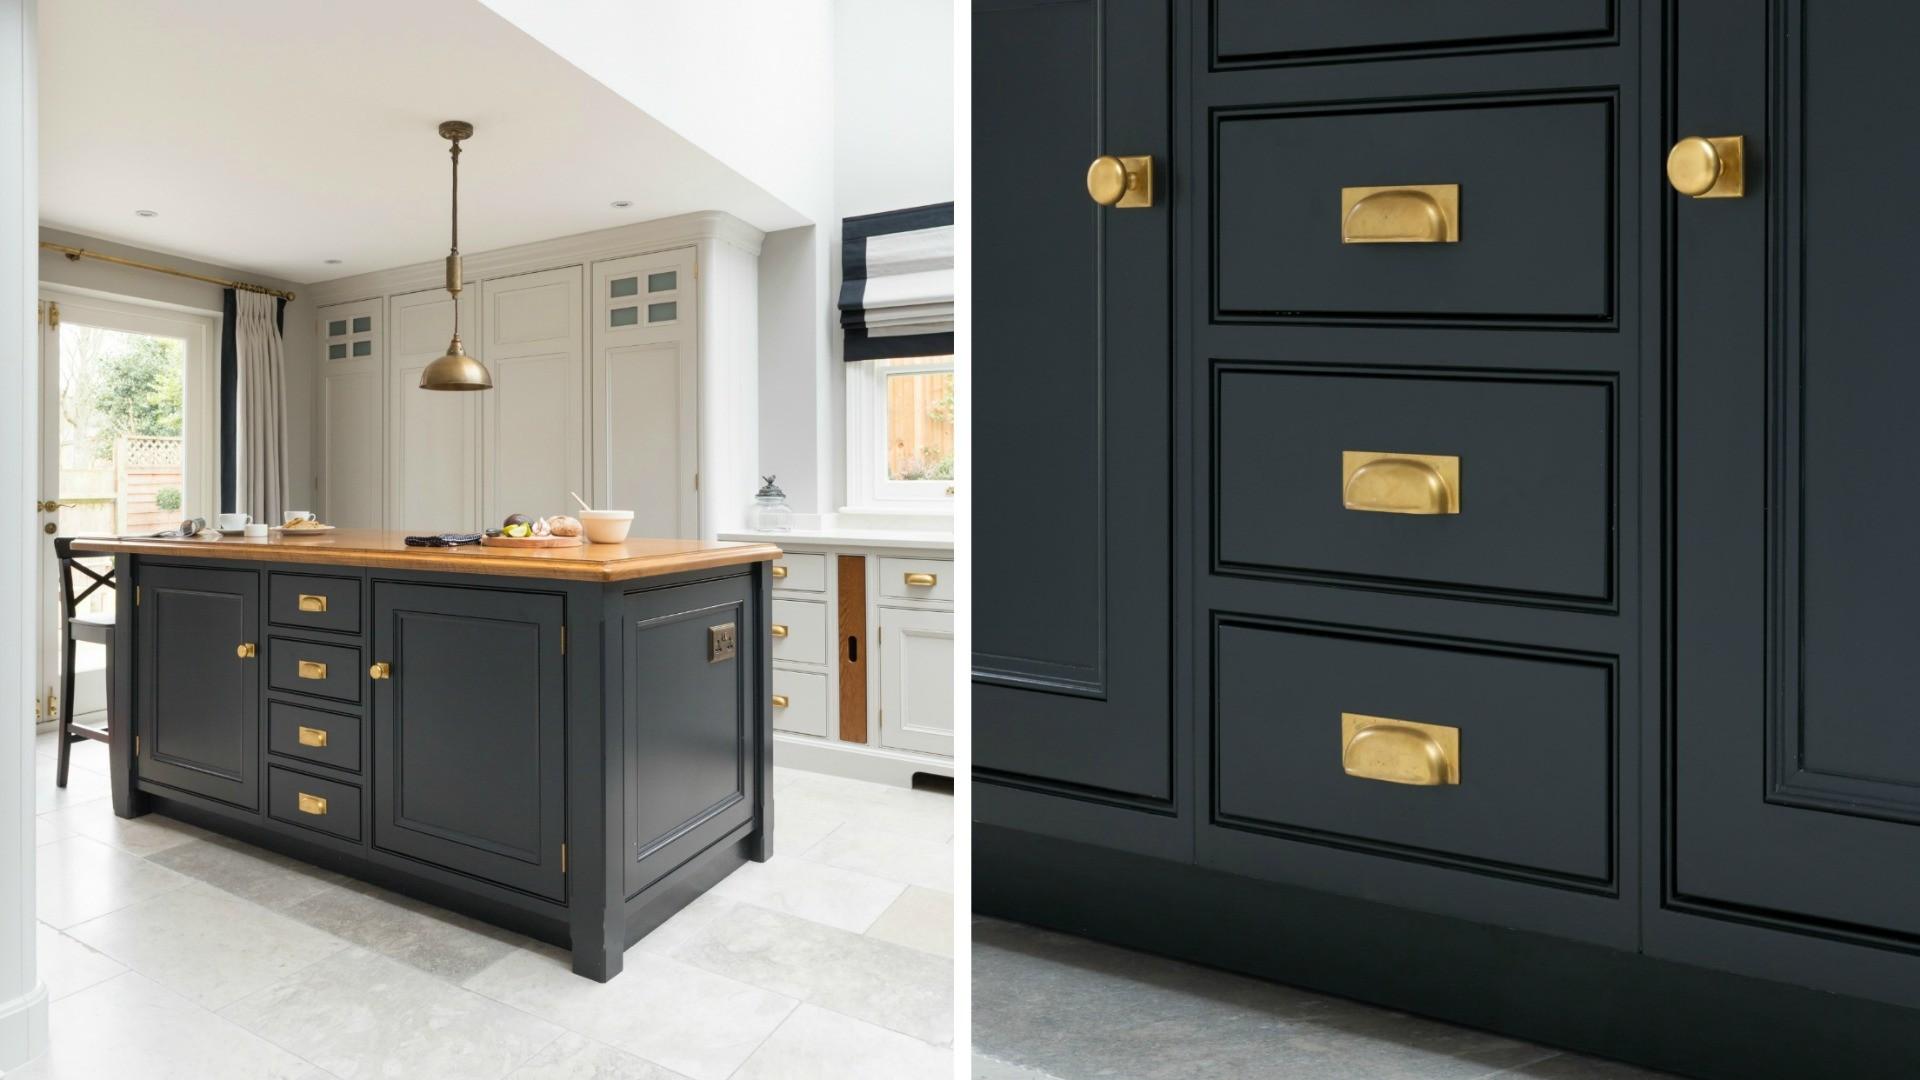 Luxury-Bespoke-Kitchen-Blackheath-London-Humphrey-Munson-6-1.jpg